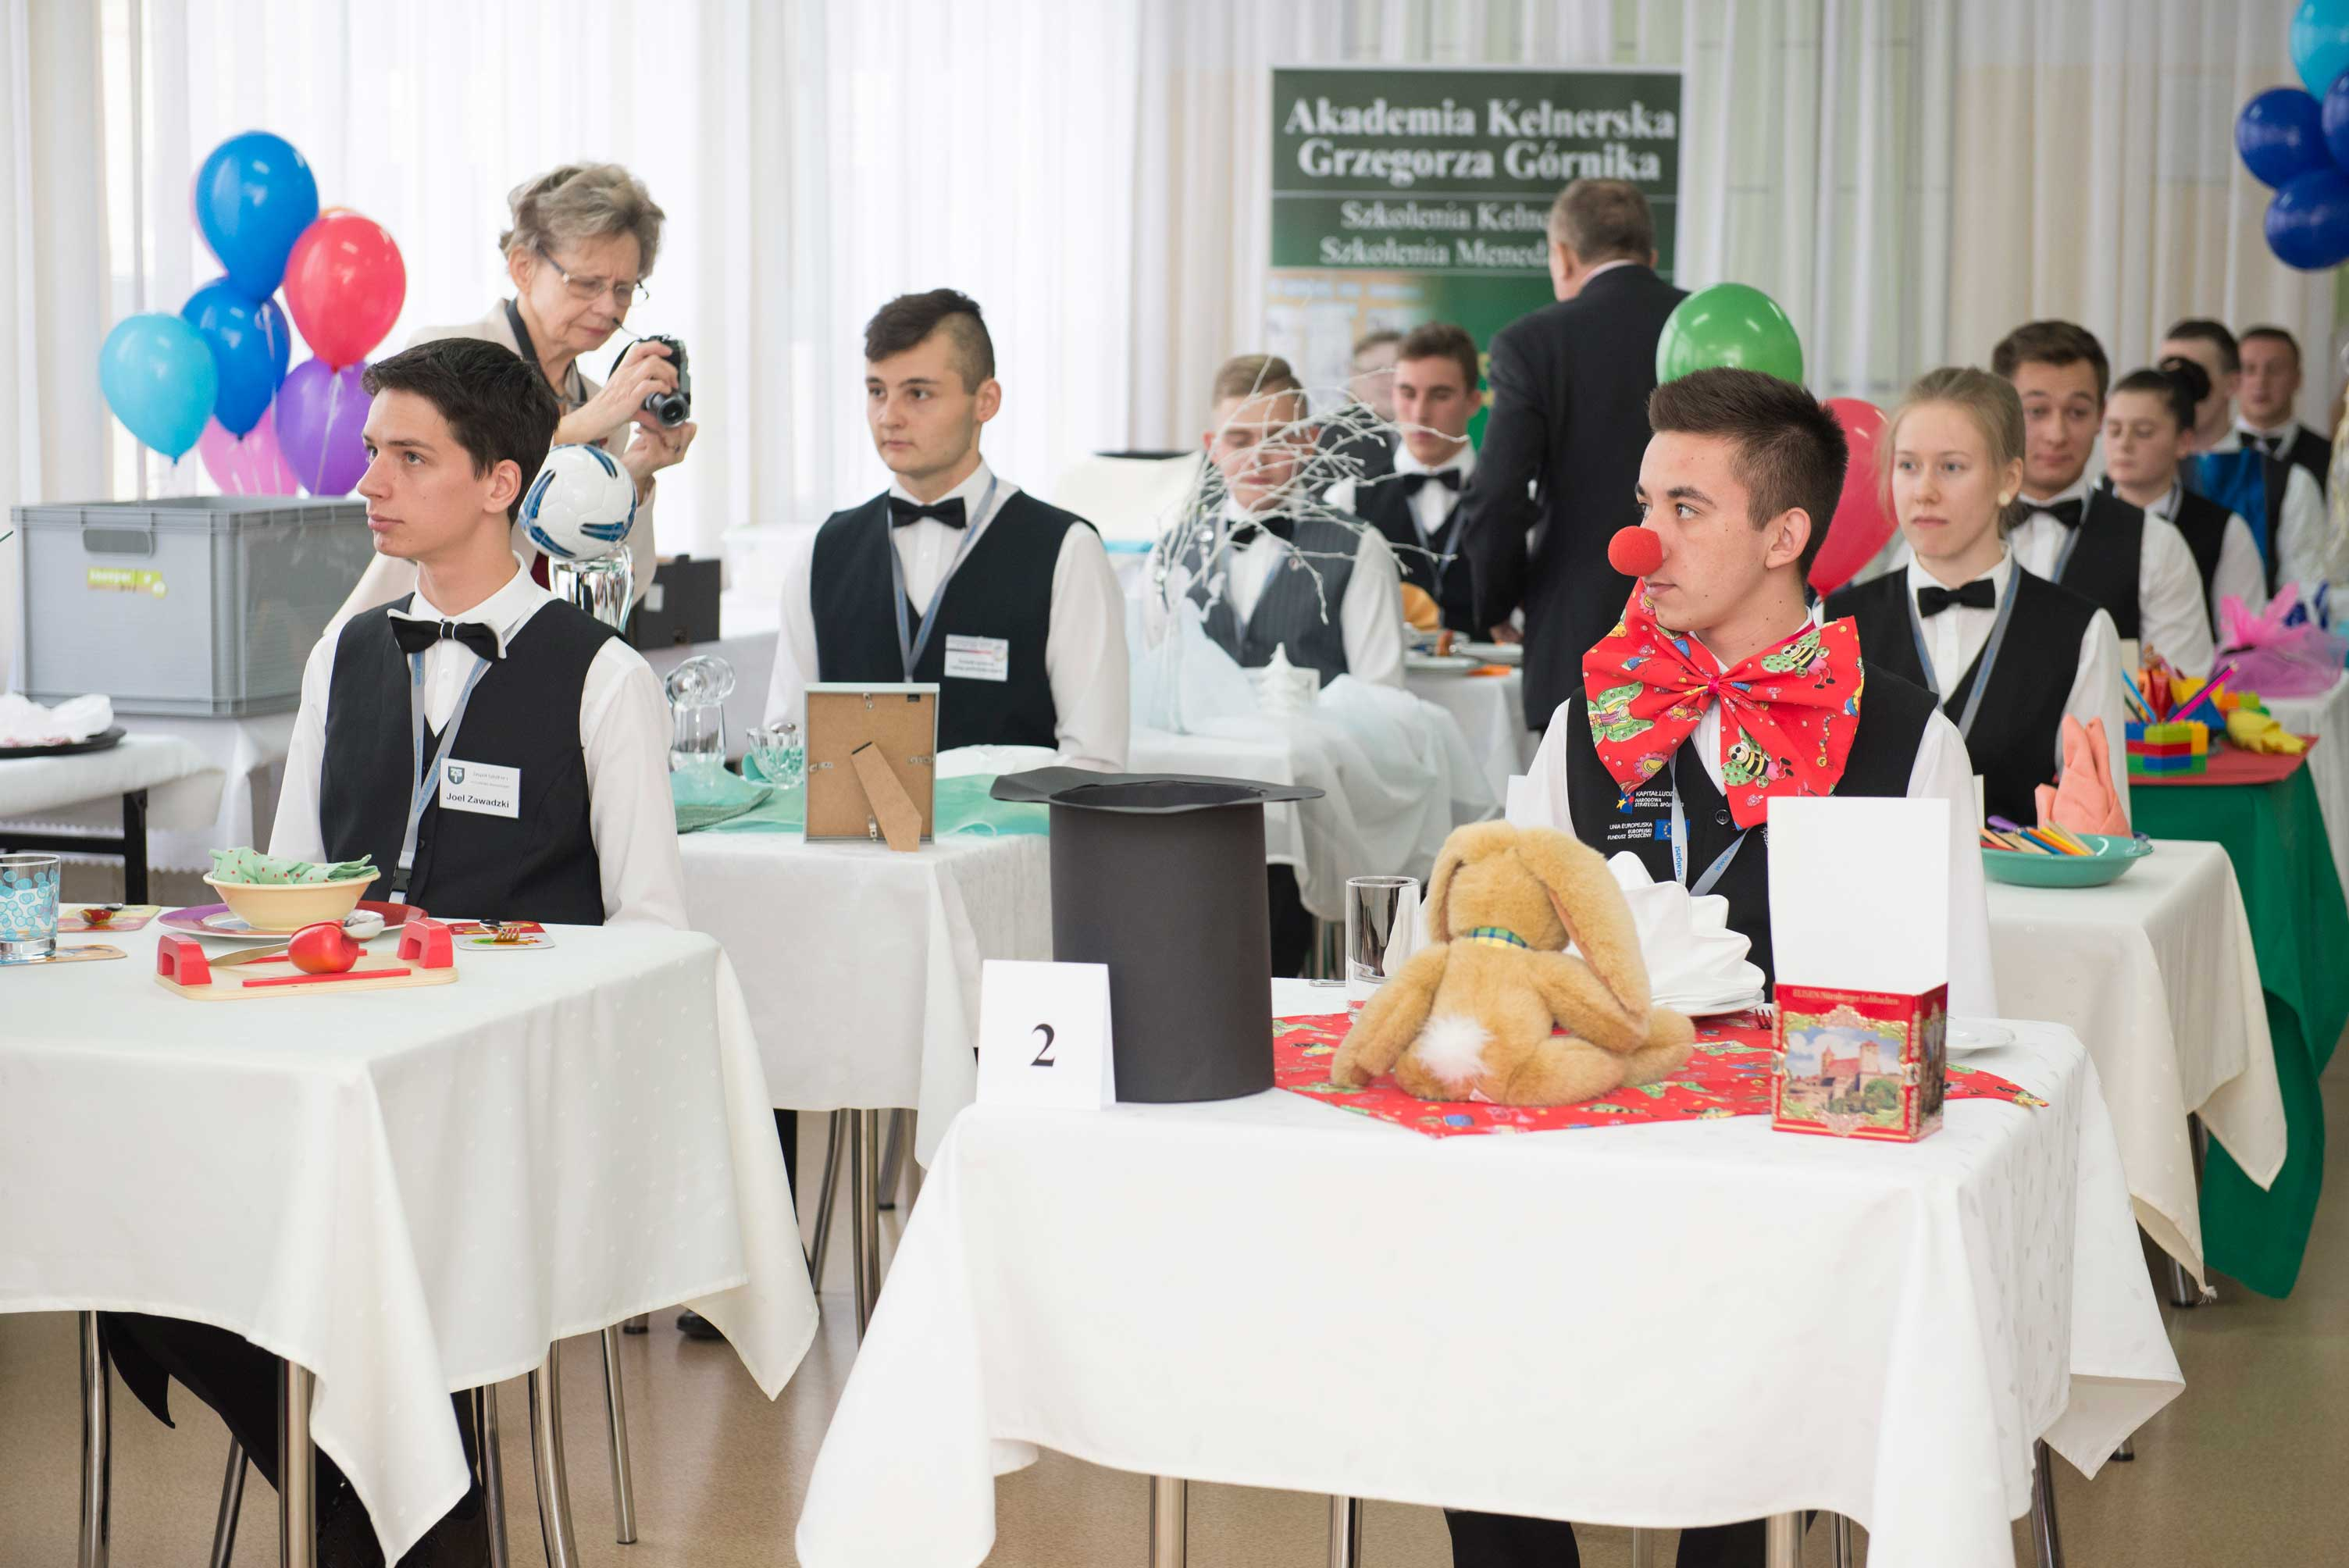 Kuchnia Polska Na Mazowszu 2016 Newsgastropl